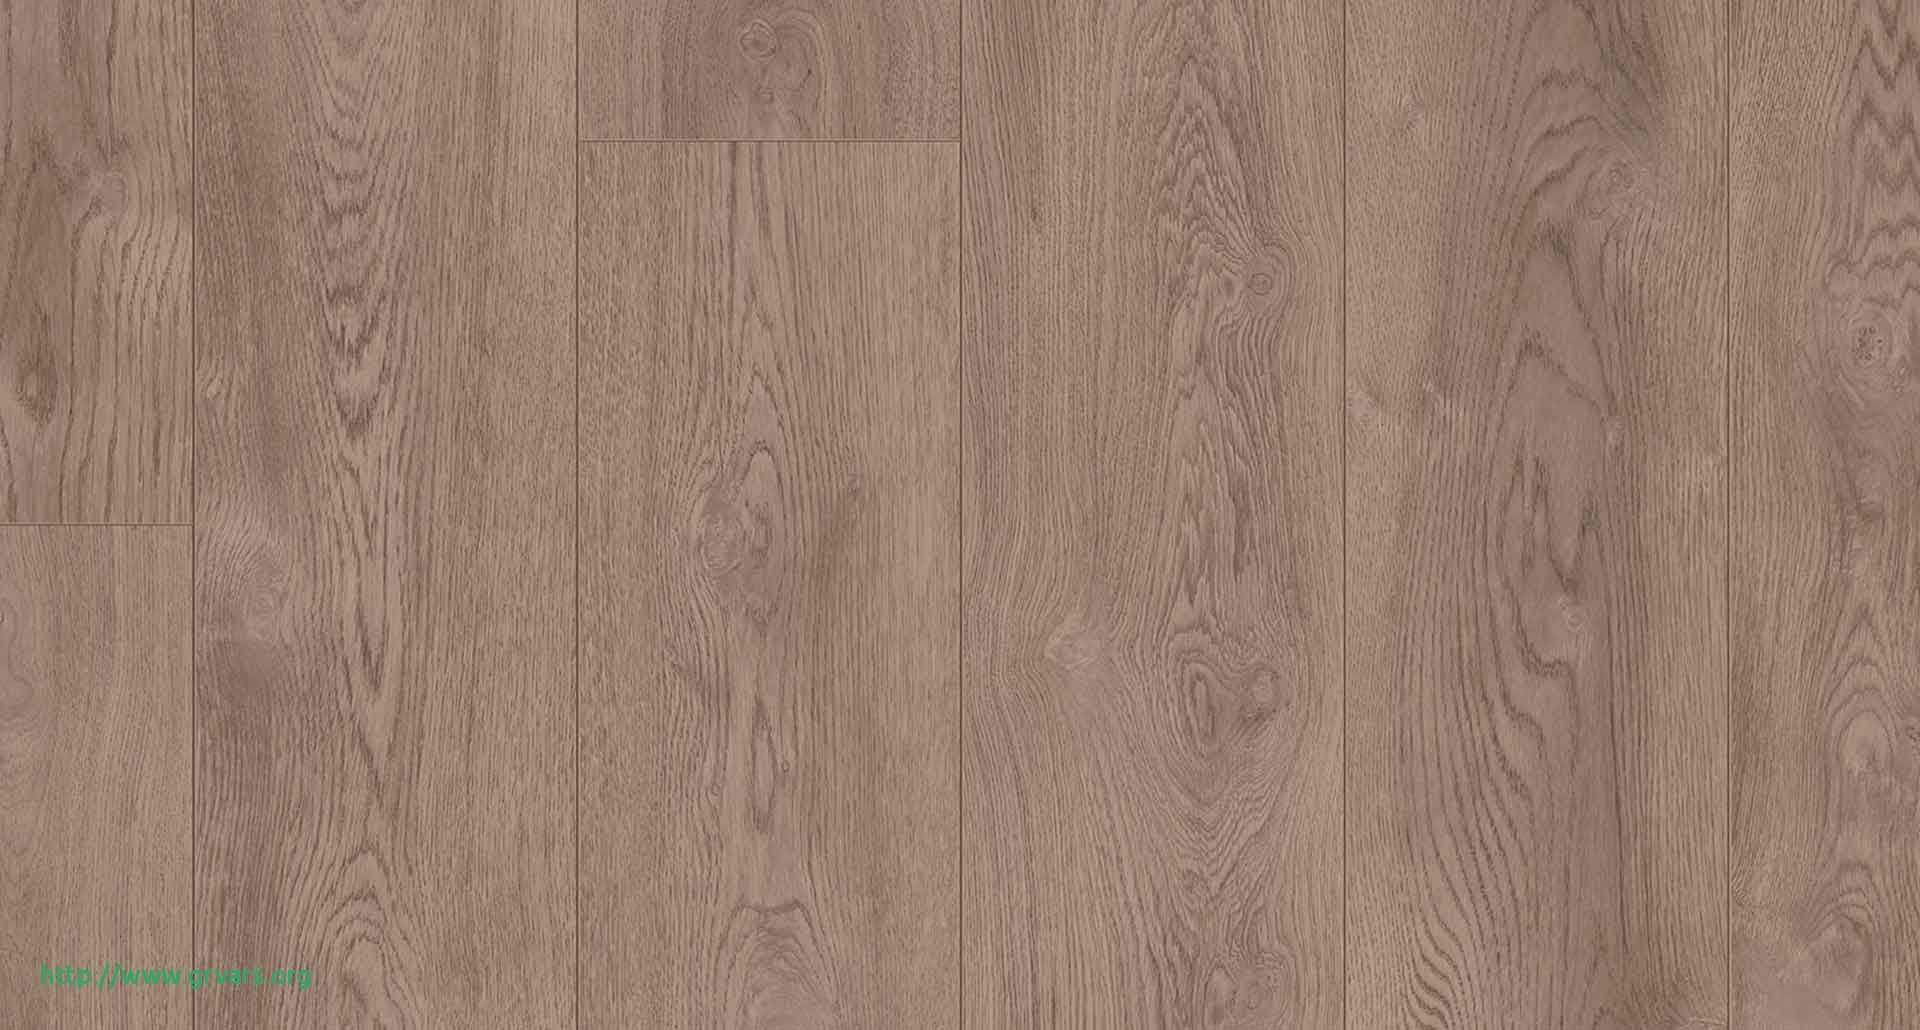 hardwood flooring definition of strip flooring definition nouveau samsung sled 2010svs46 60 240hz 72 with regard to strip flooring definition luxe london oak natural authentic laminate floor grey oak wood finish